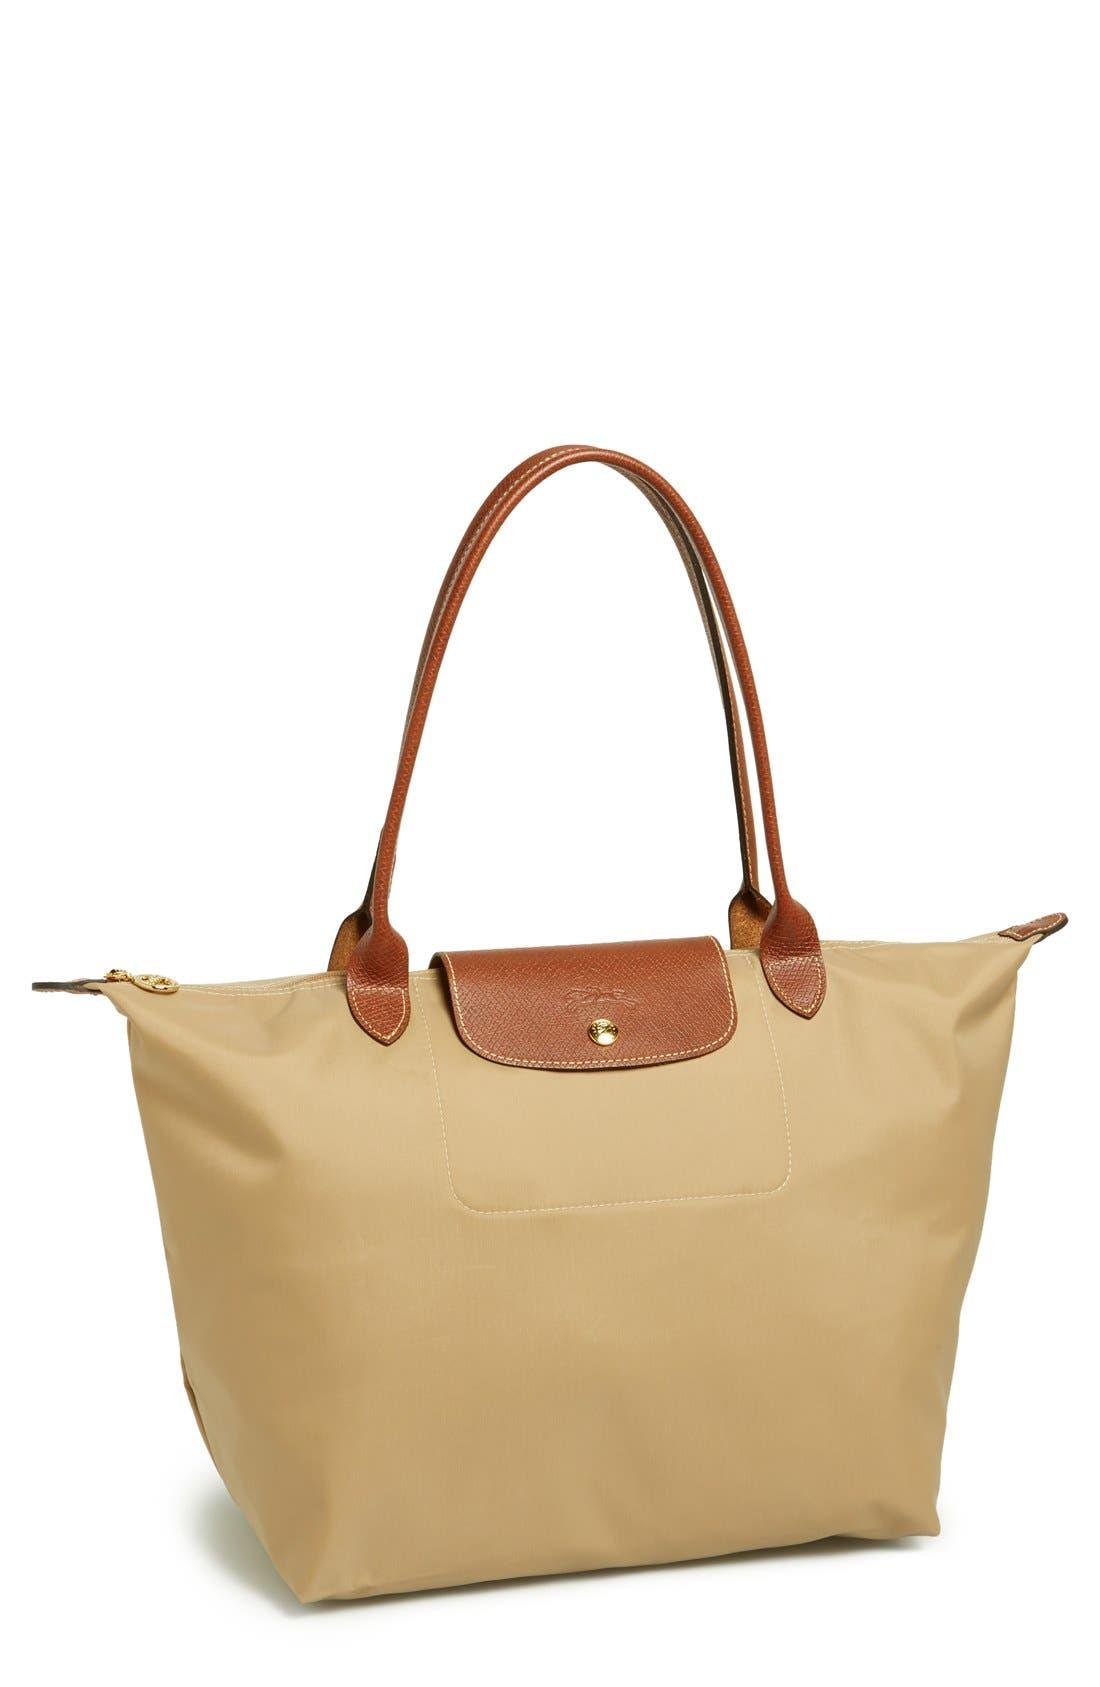 Beau Designer Purse Parties At Home. Sponsored Links. Longchamp Ularge Le  Pliageu Tote.